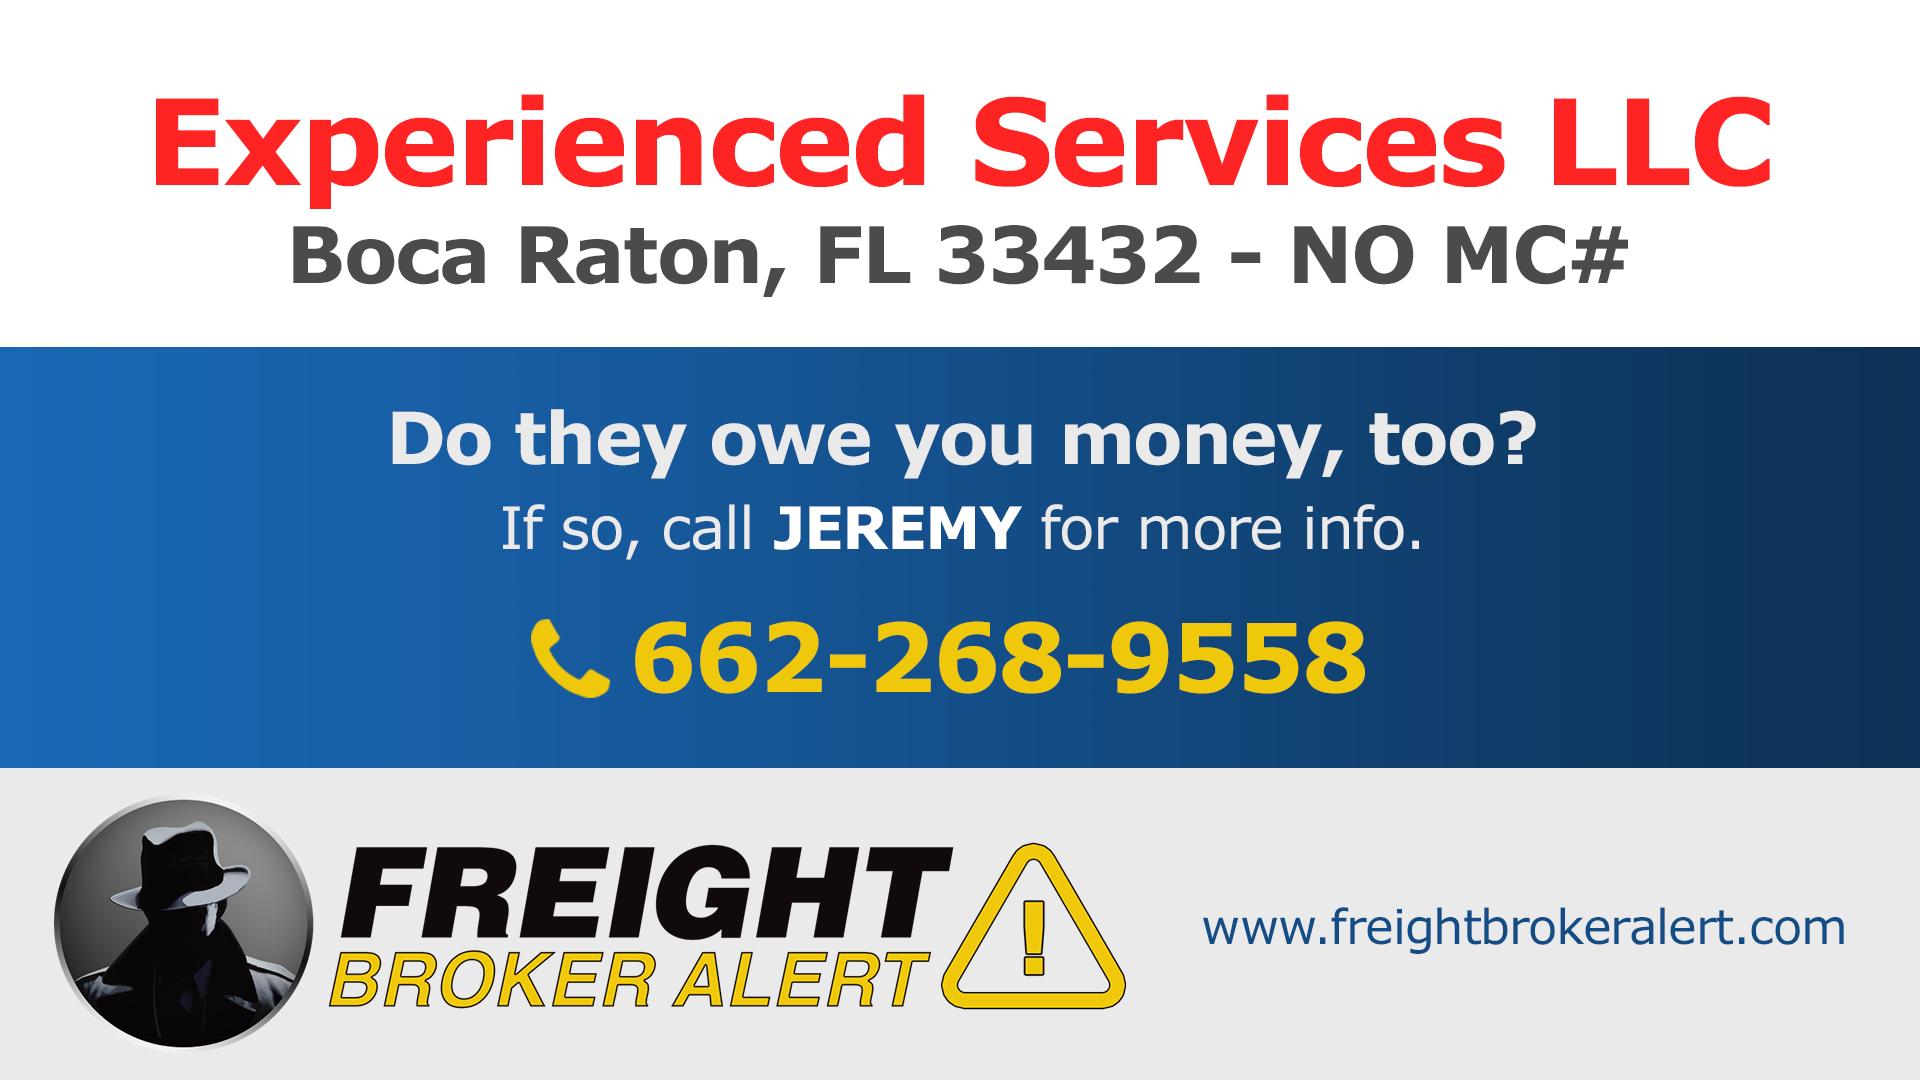 Experienced Services LLC Florida